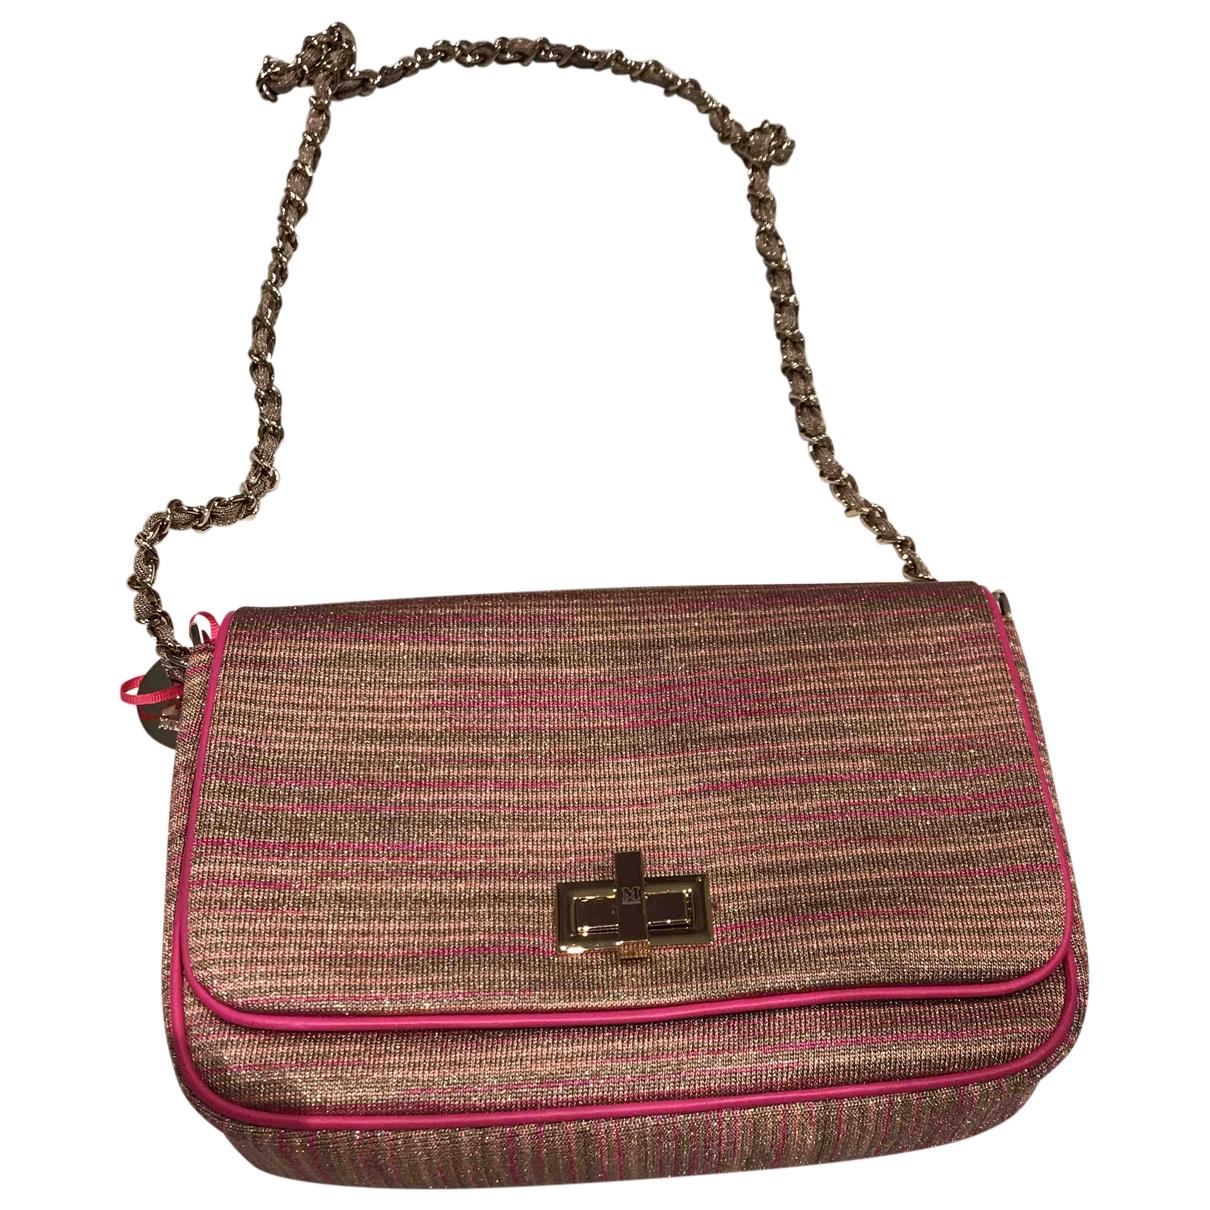 M Missoni \N Pink Leather handbag for Women \N